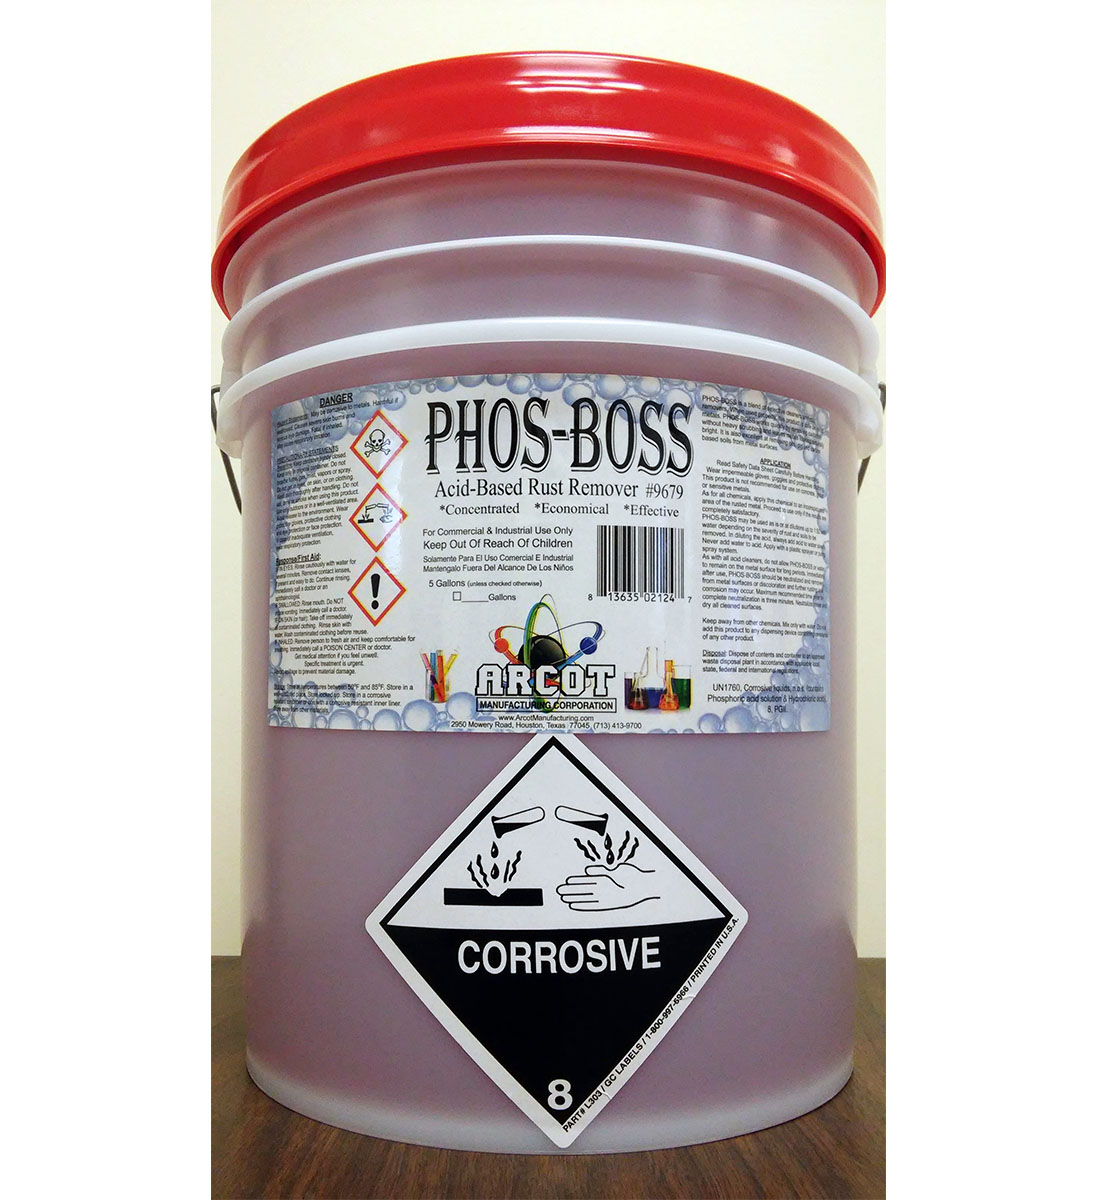 Phos-Boss